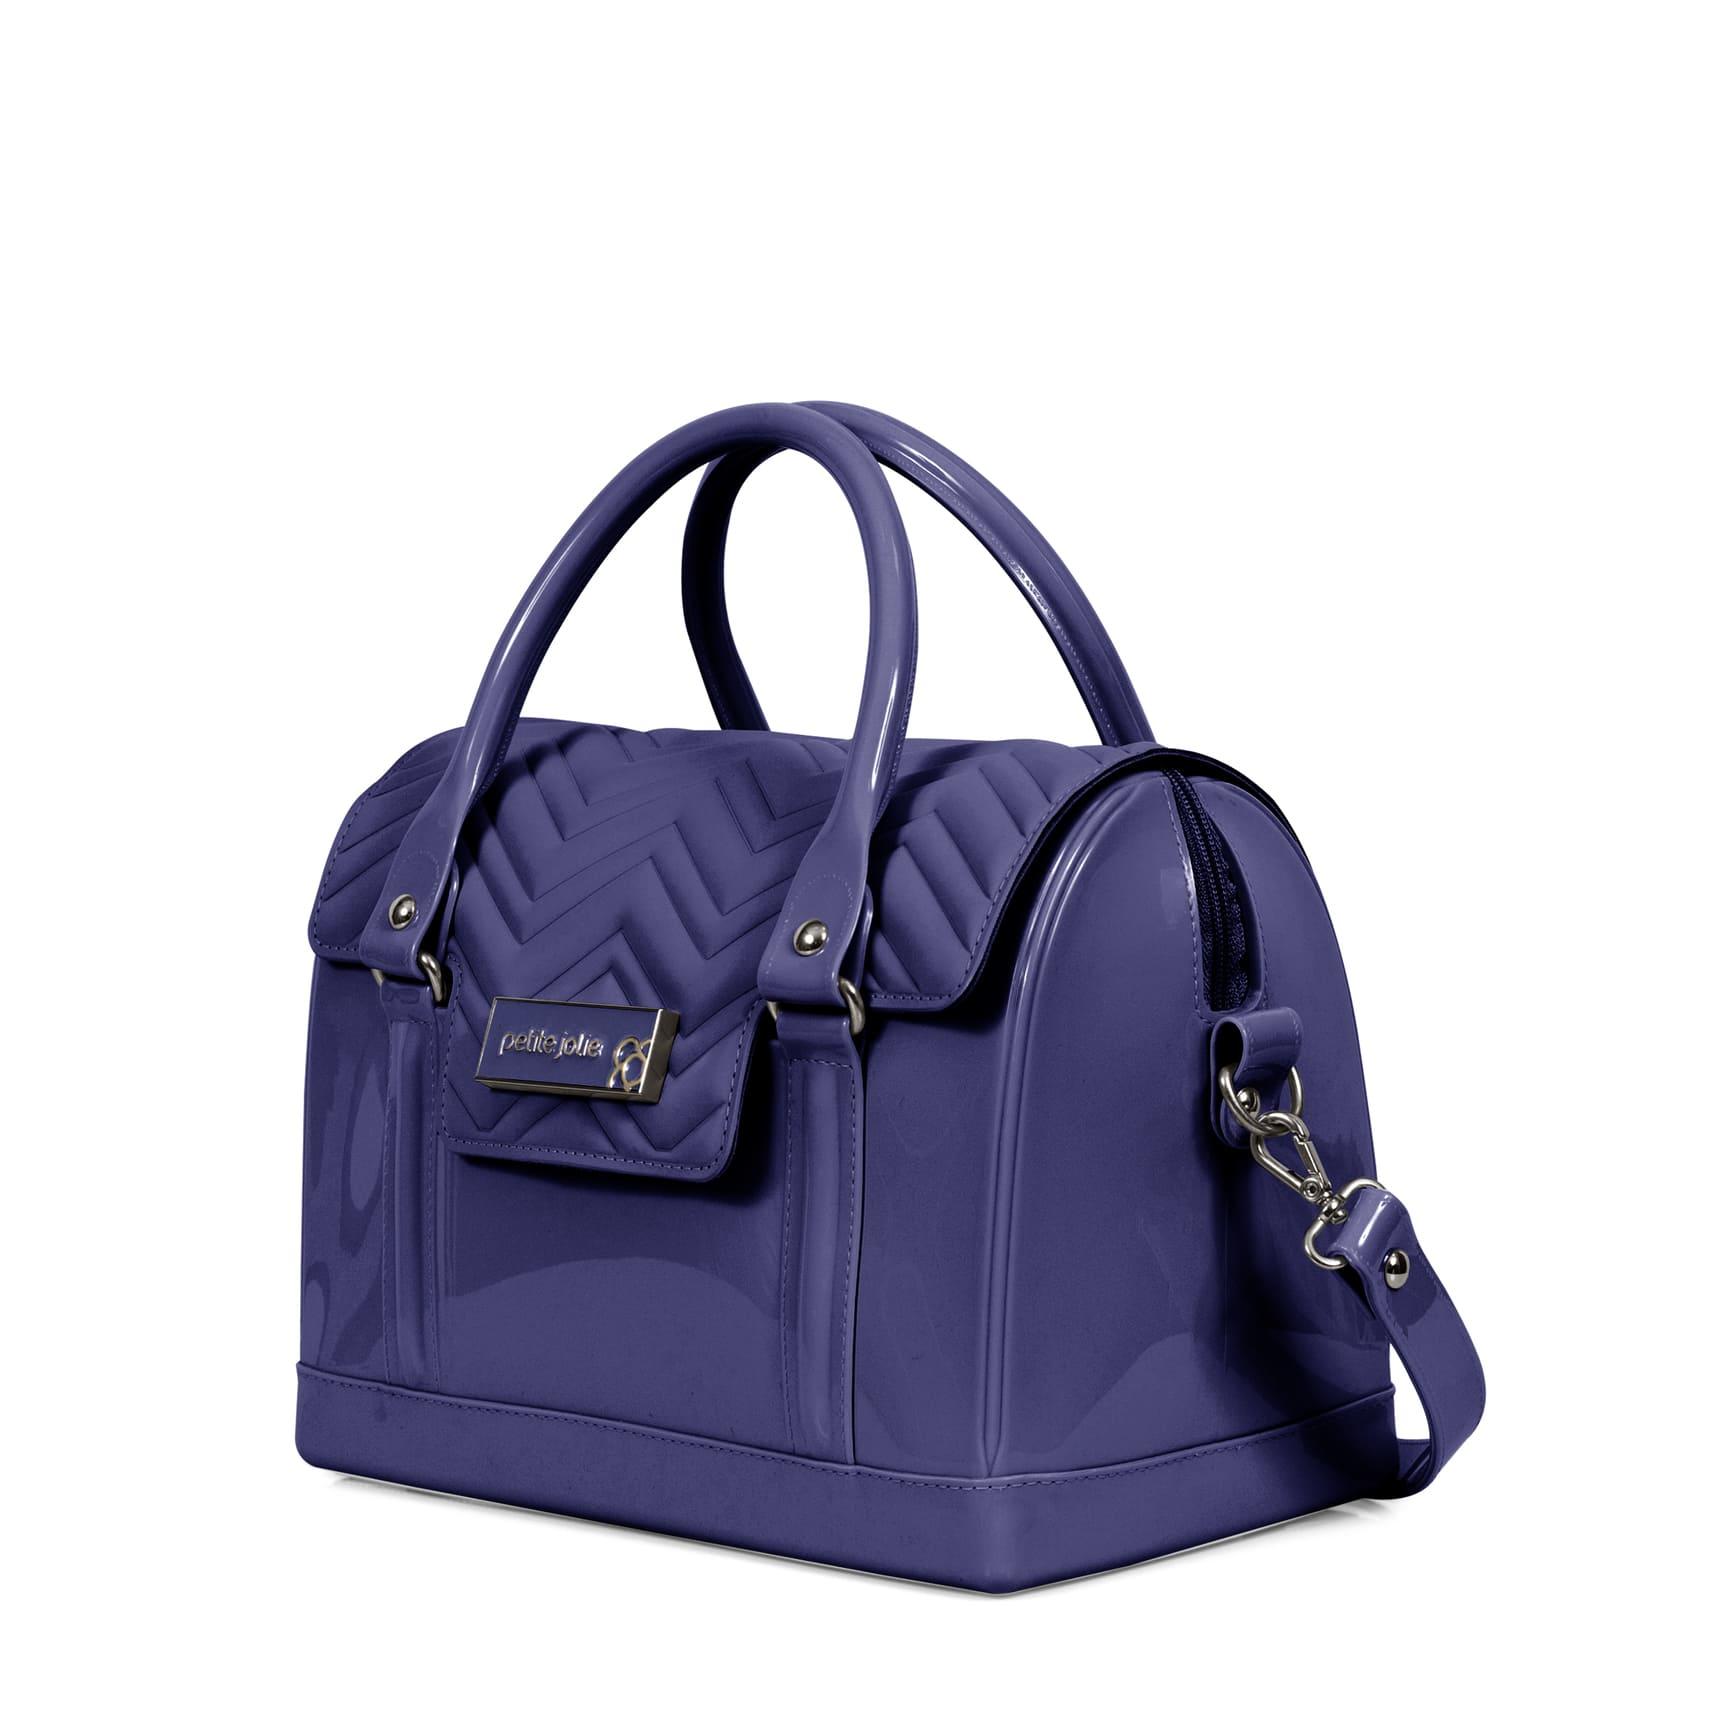 Bolsa Petite Jolie Bloom Maleta PJ3903 Azul  - Prime Bolsas